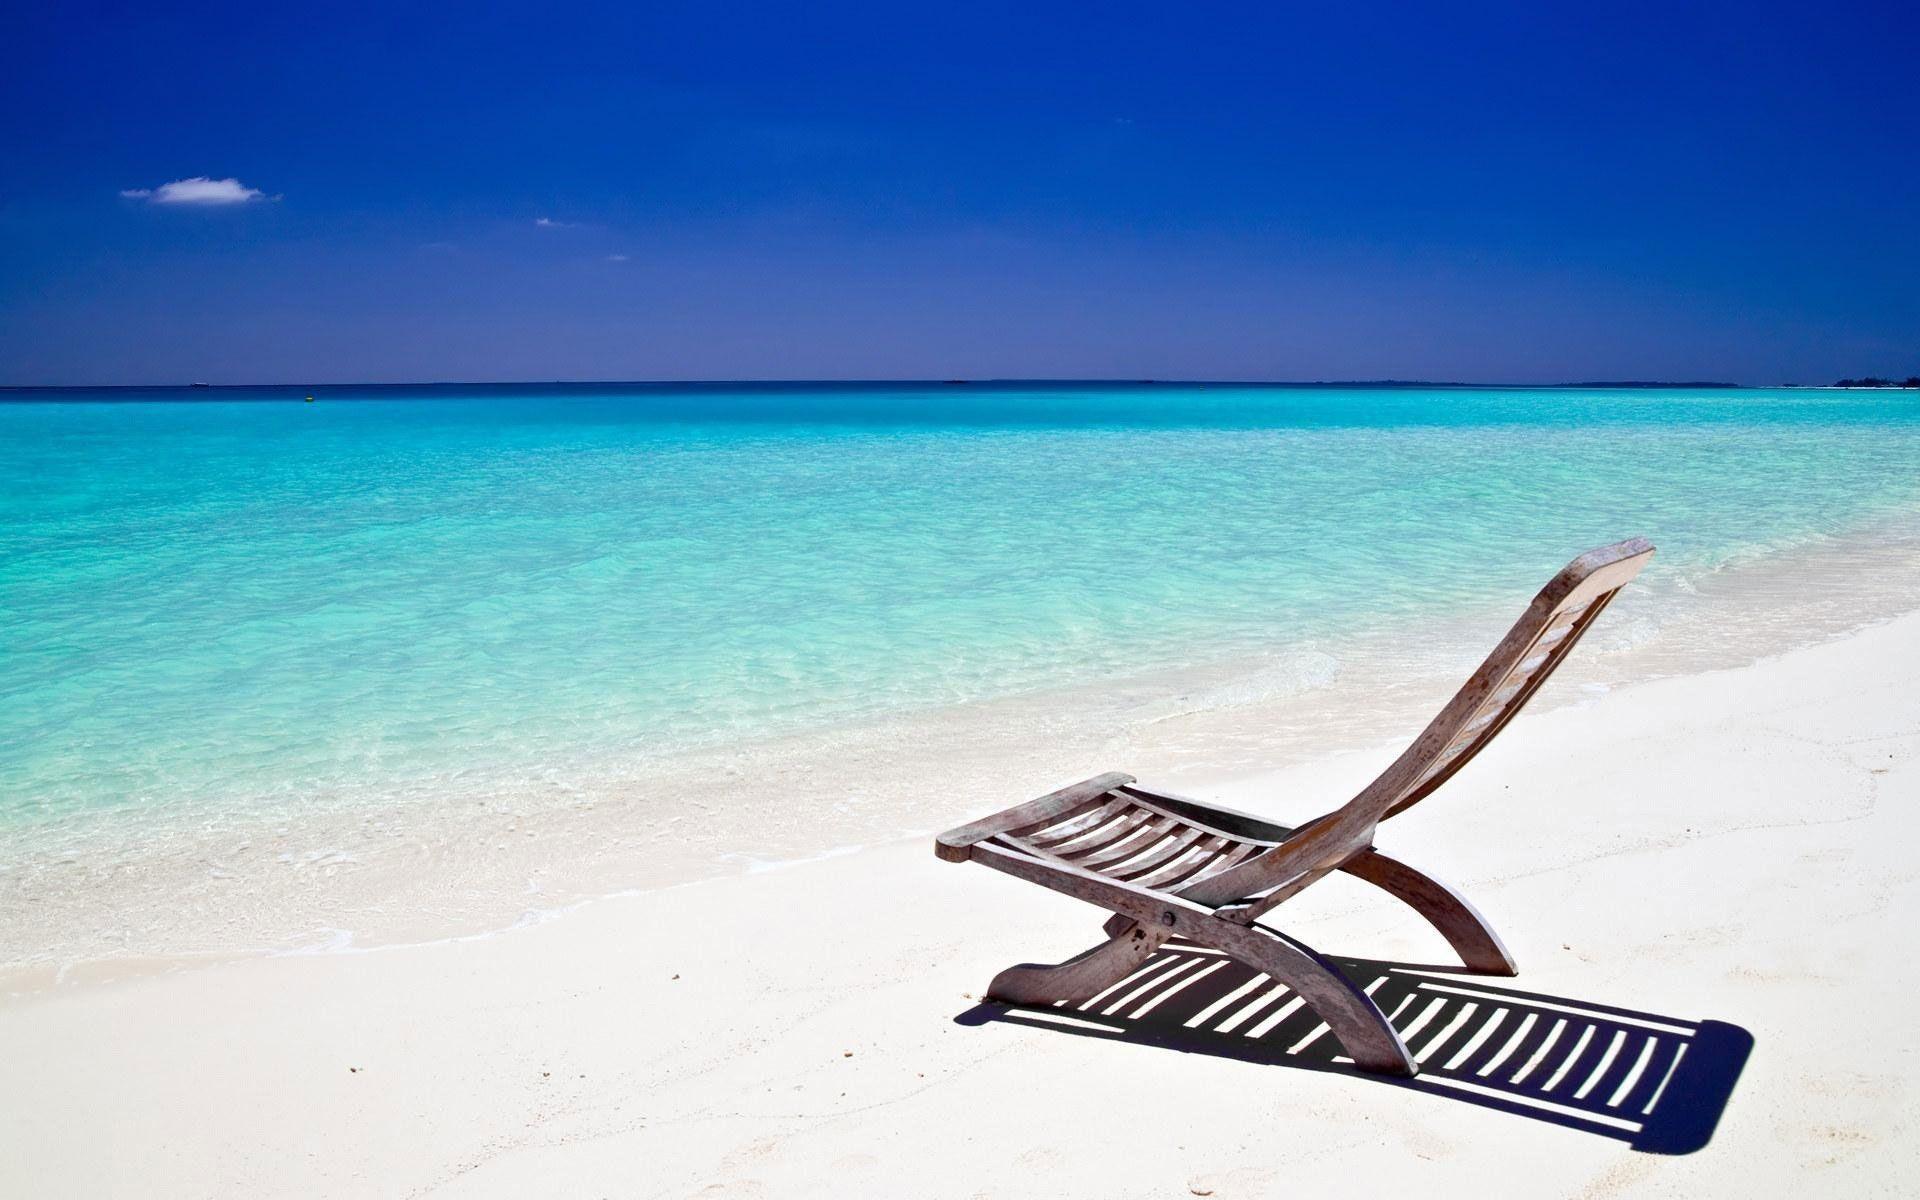 35 Desktop backgrounds beach ·â' Download free beautiful full HD